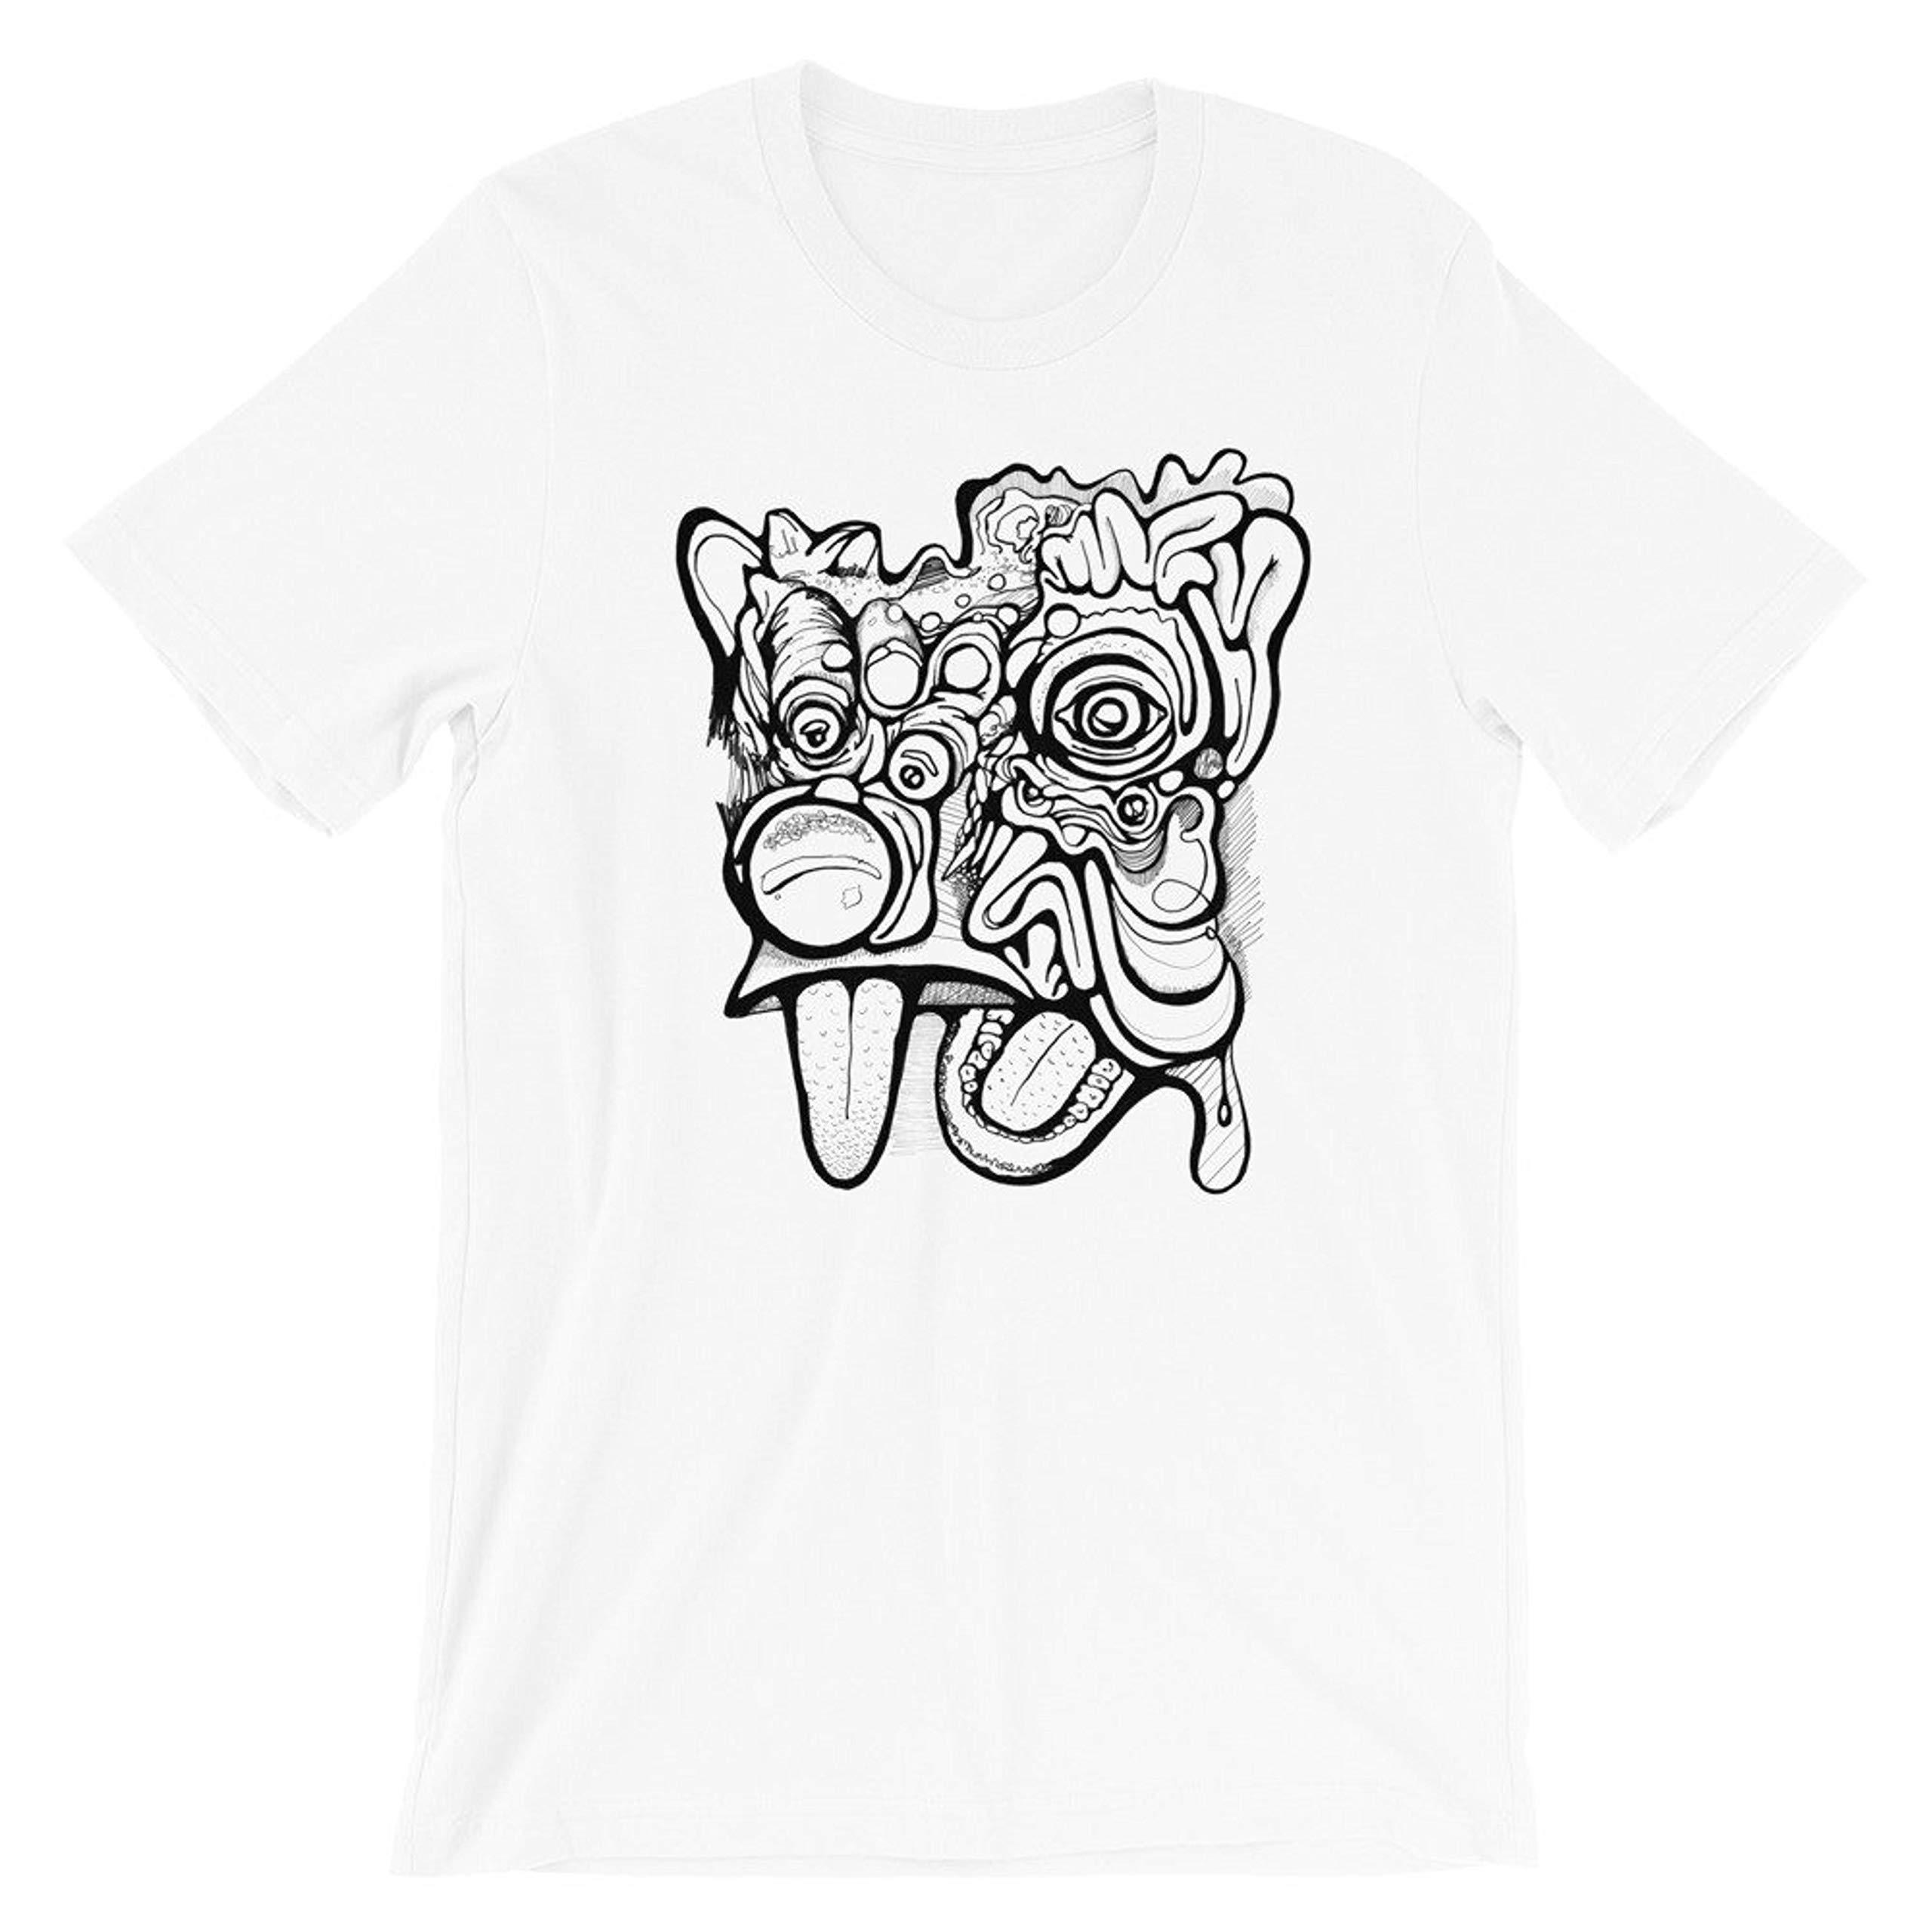 The Goblin Shirts